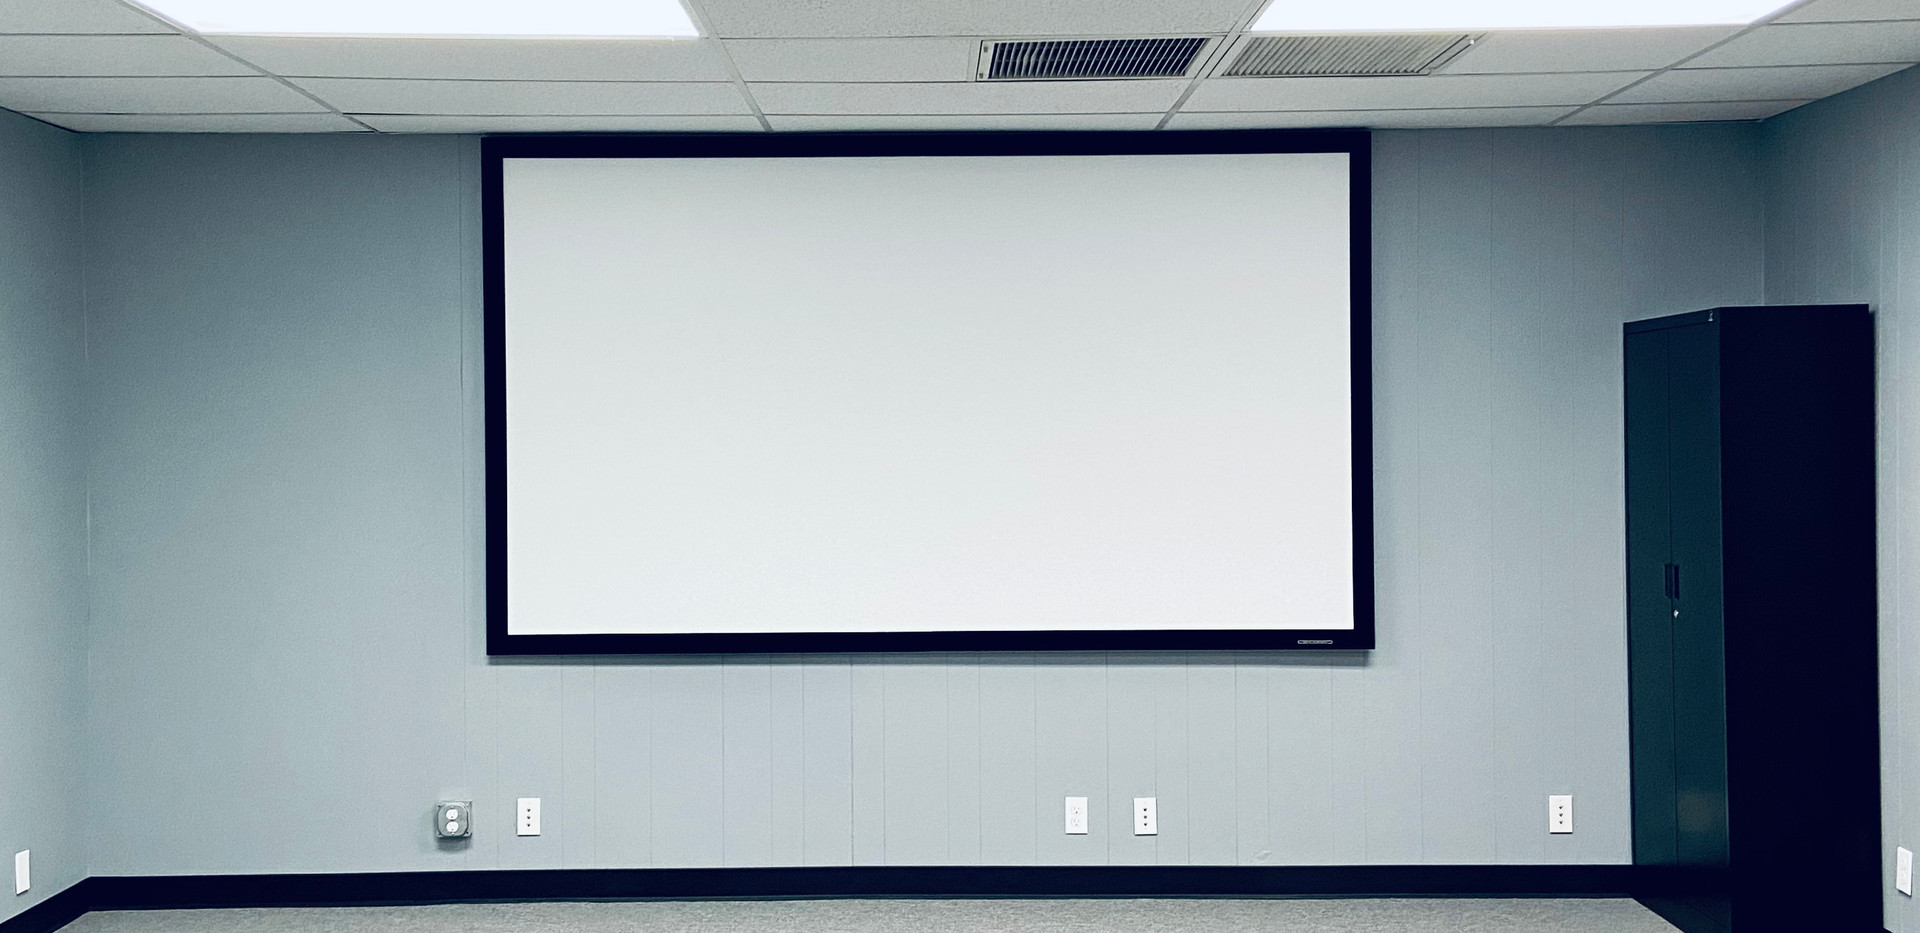 New Screen